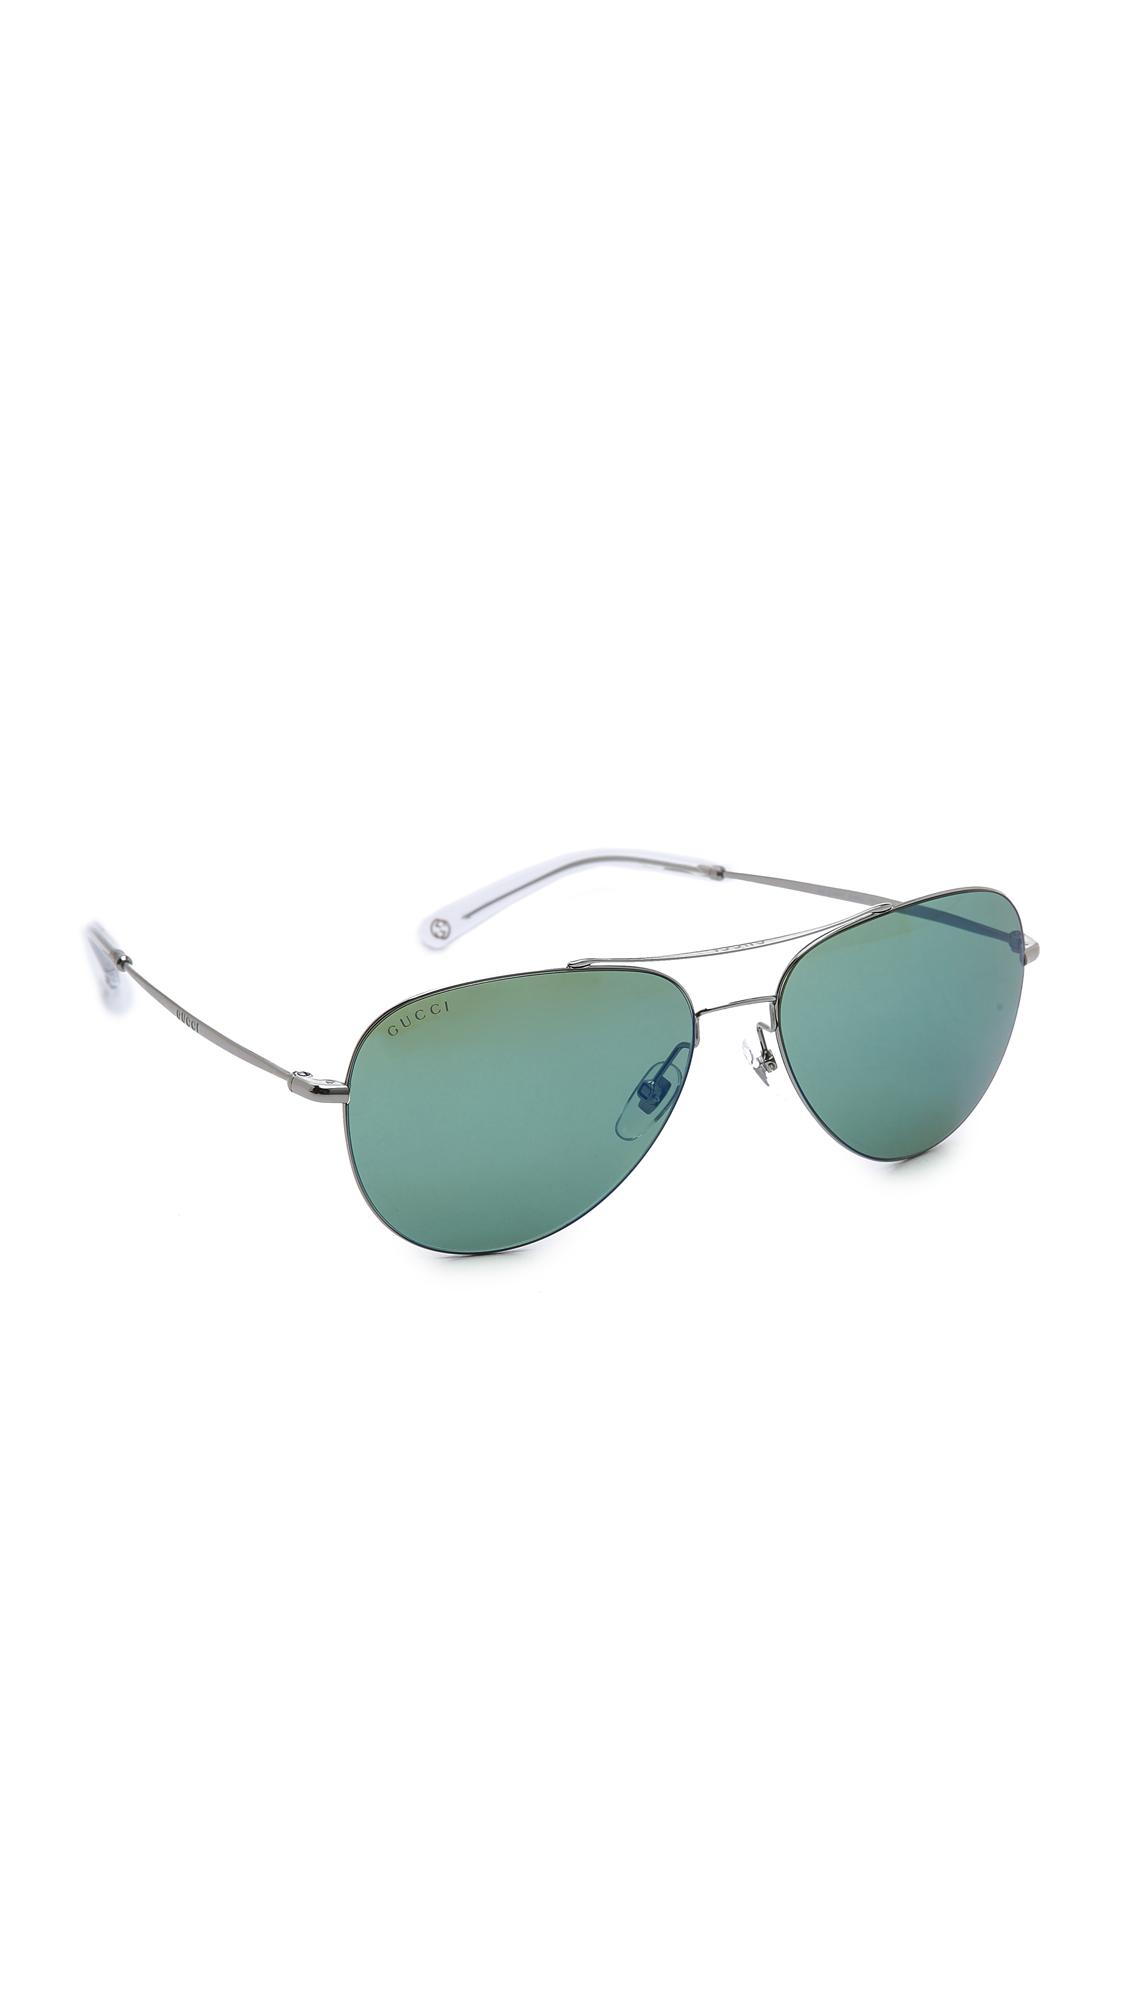 Lyst Gucci Aviator Mirror Sunglasses Ruthenium Green